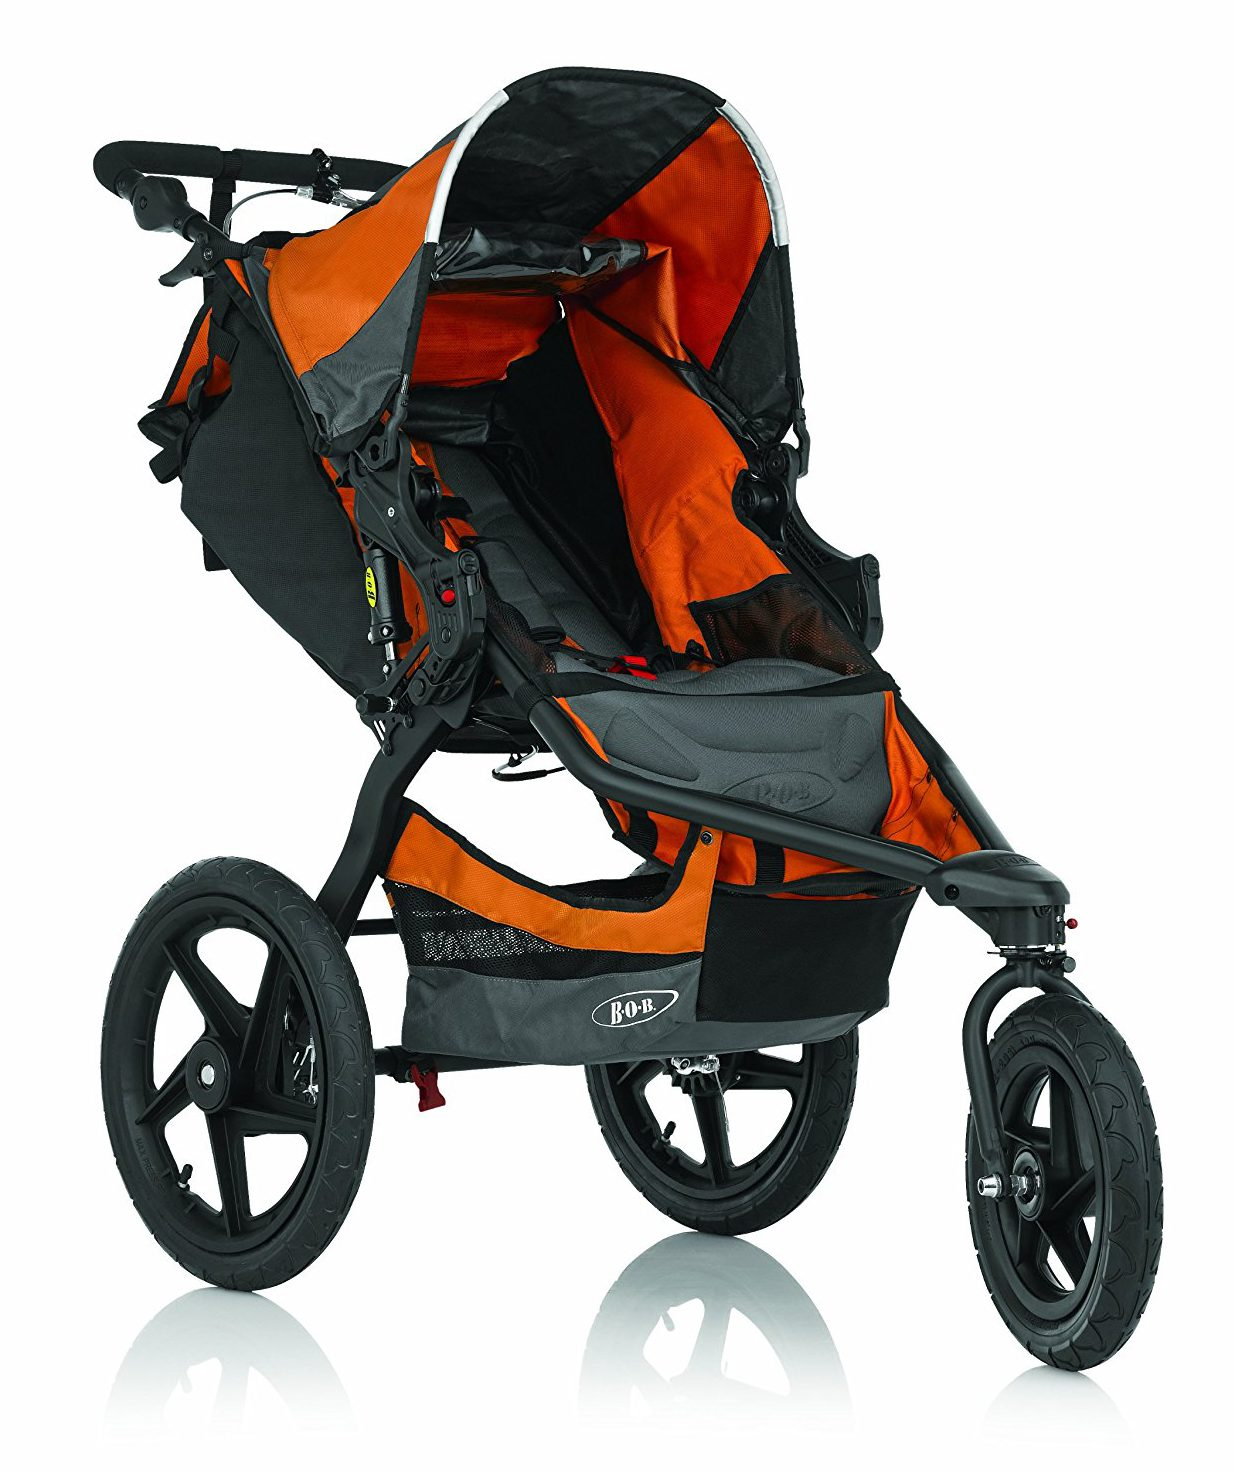 outdoor kinderwagen vergleich die besten outdoor buggys. Black Bedroom Furniture Sets. Home Design Ideas